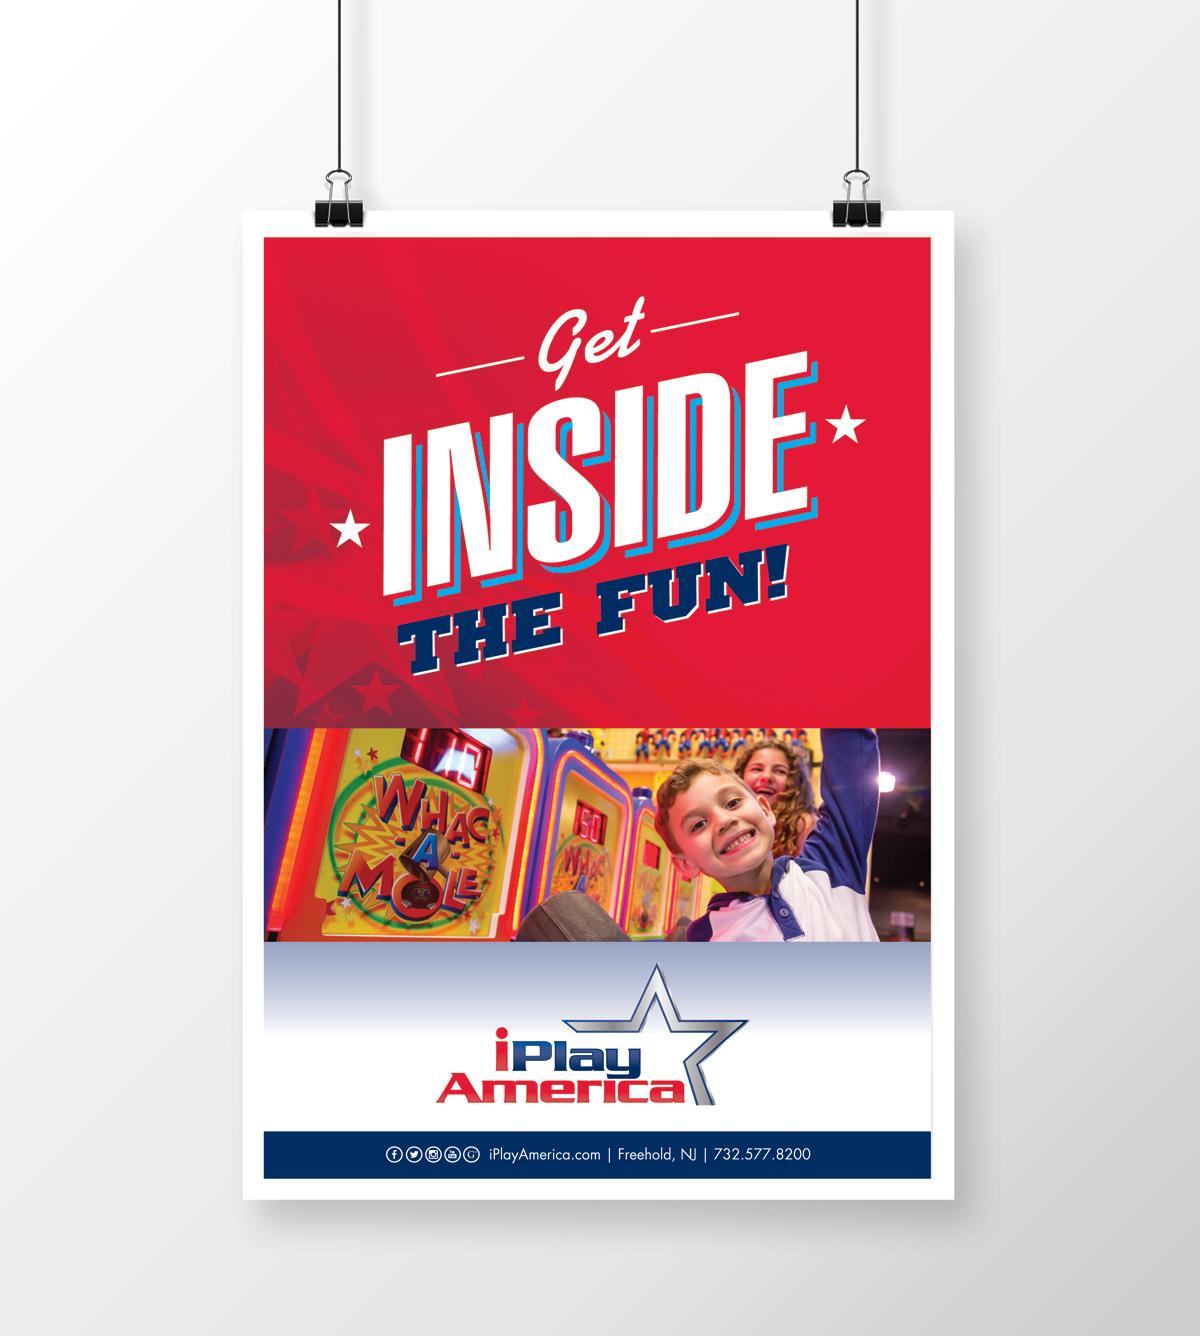 iPlay America poster